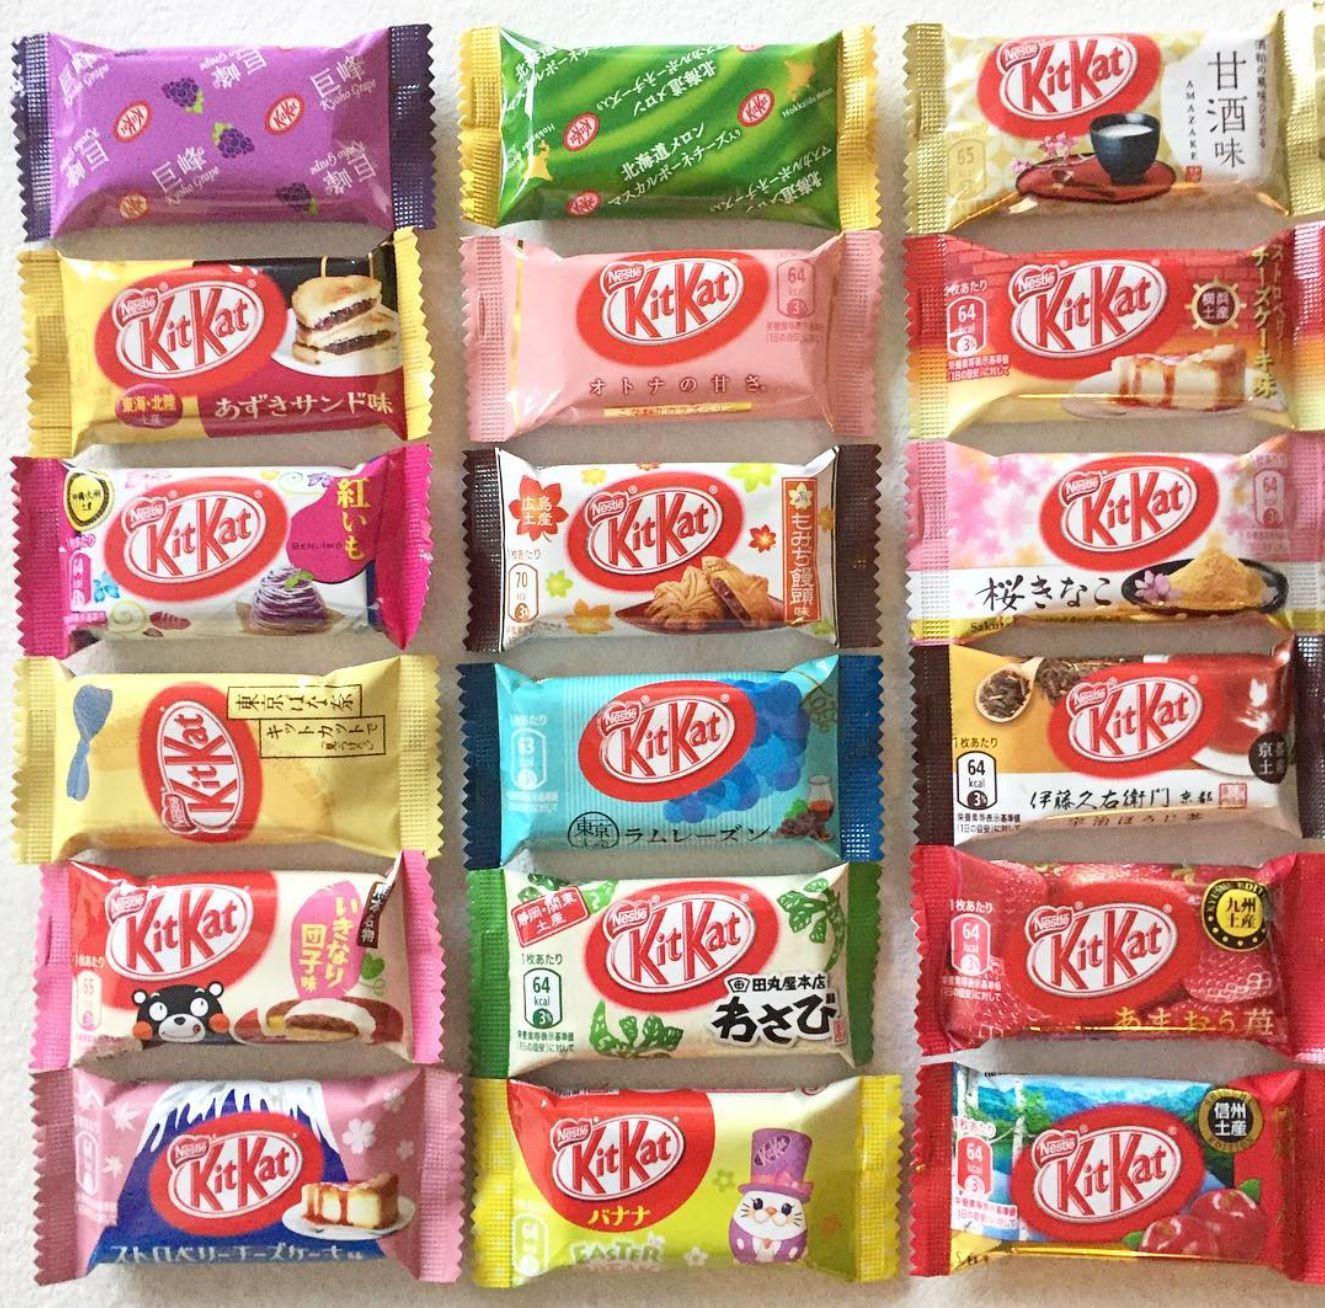 La mania dei giapponesi per il Kit Kat